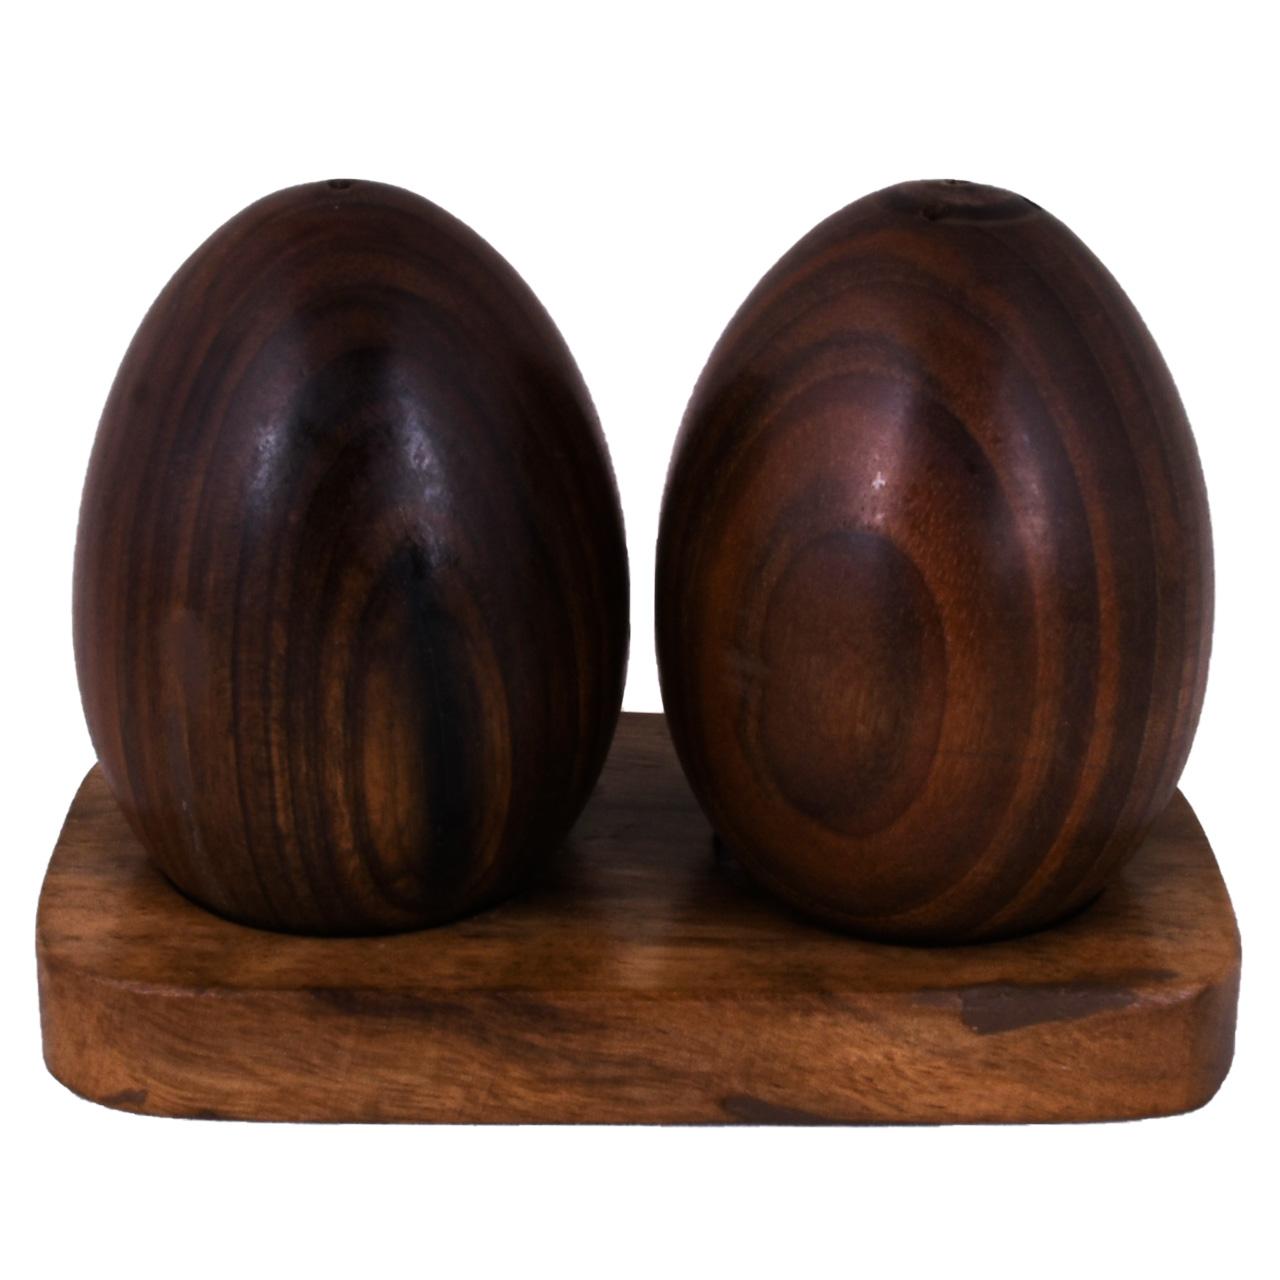 نمکدان چوبی کد 00-01 مجموعه دو عددی